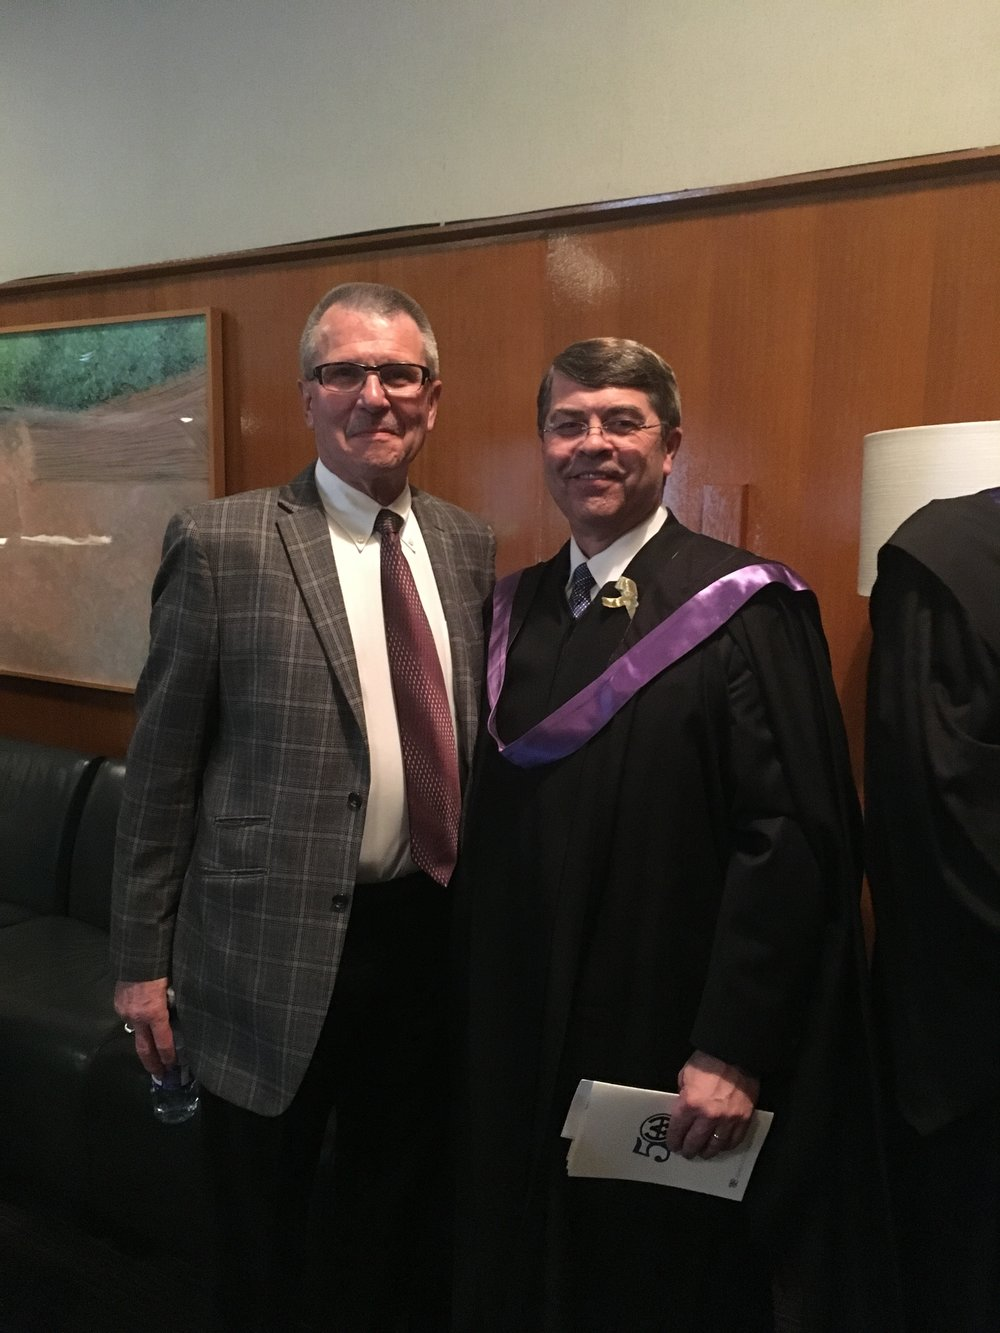 Councillor Anderson and Harry Ainlay principal Gane Olsen